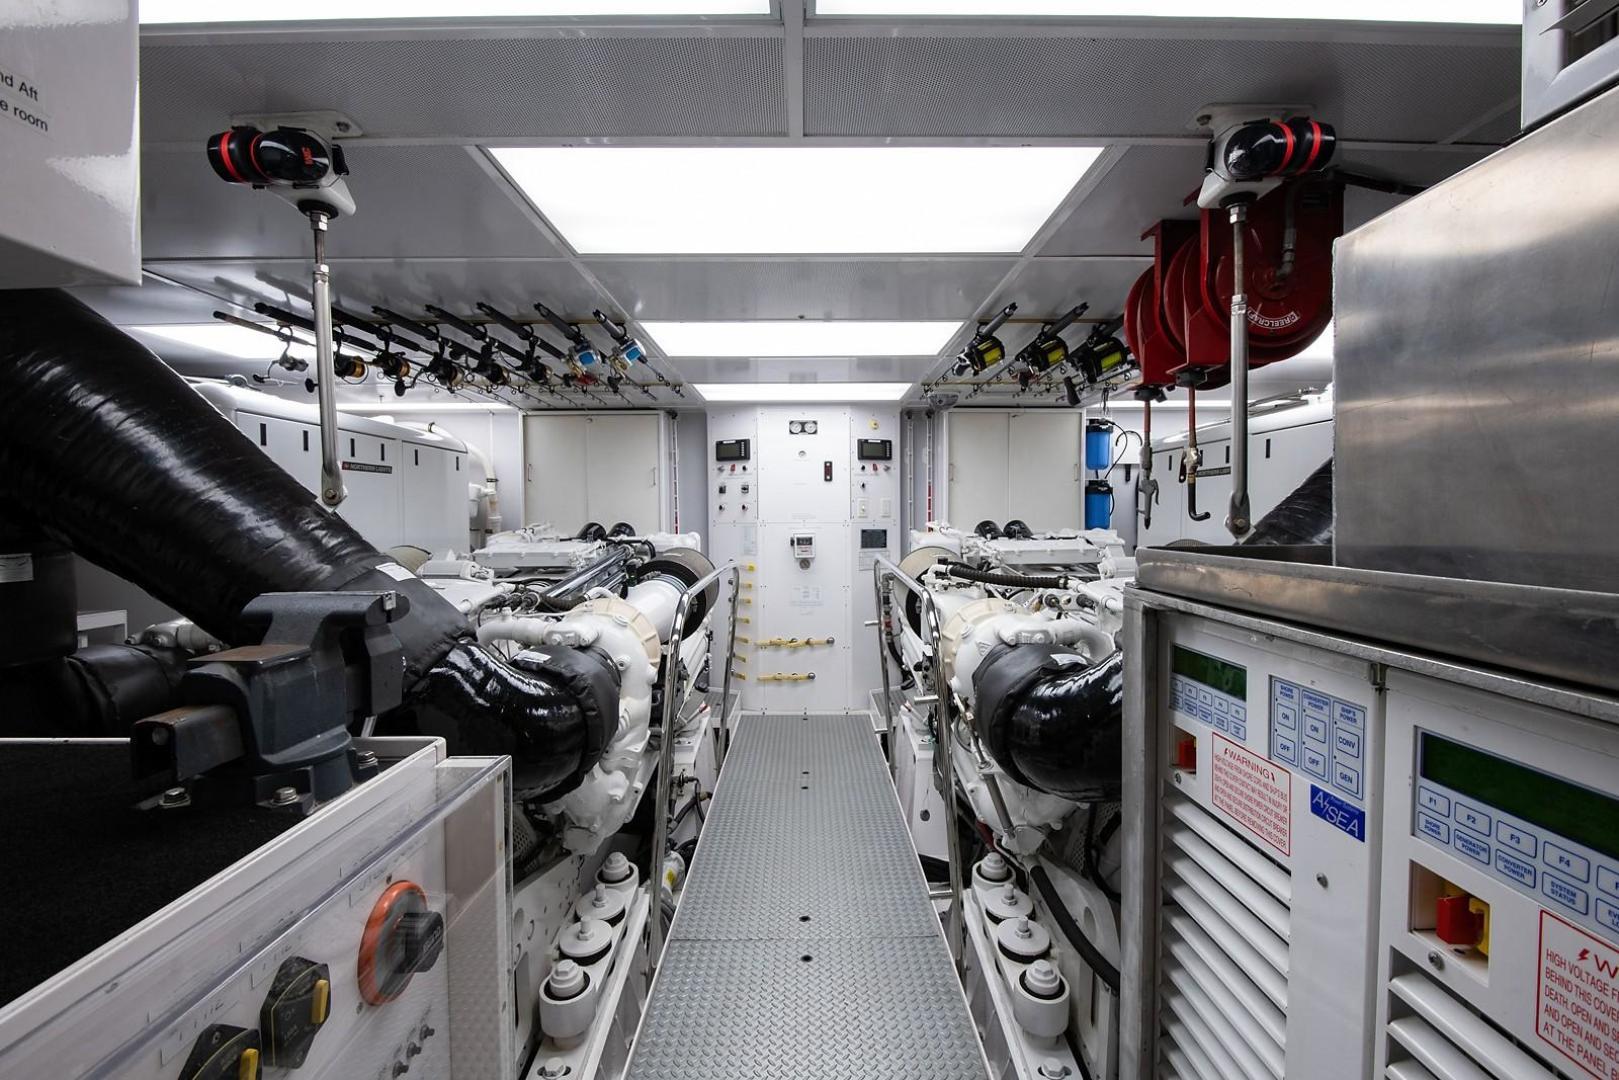 Westport-Motoryacht 2010-Cavallino Fort Lauderdale-Florida-United States-Engine Room-1270082 | Thumbnail